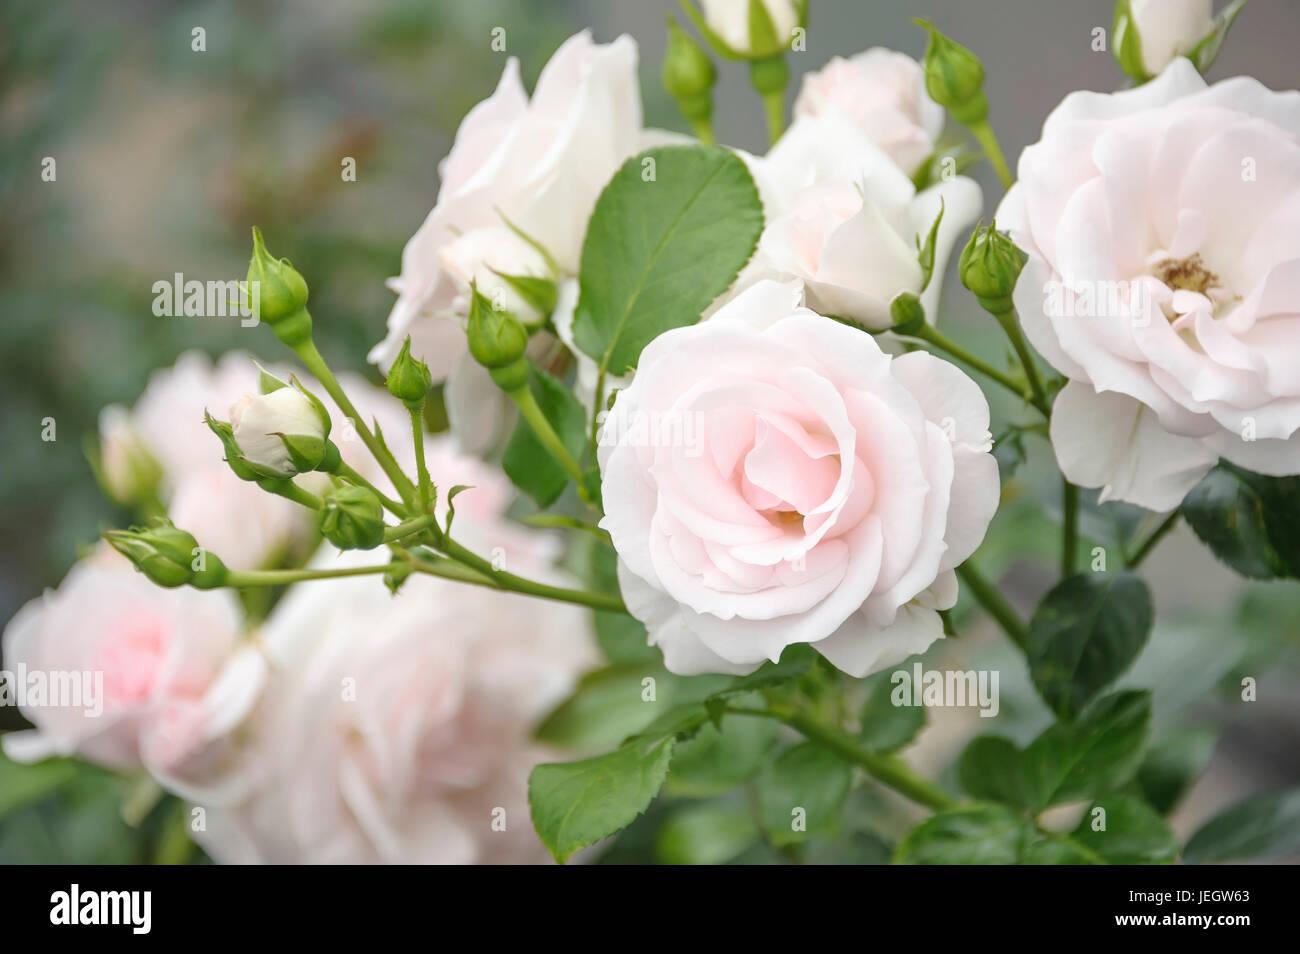 Ground deck-rose, pink ASPIRIN ROSE , Bodendecker-Rose (Rosa ASPIRIN ROSE) Stock Photo